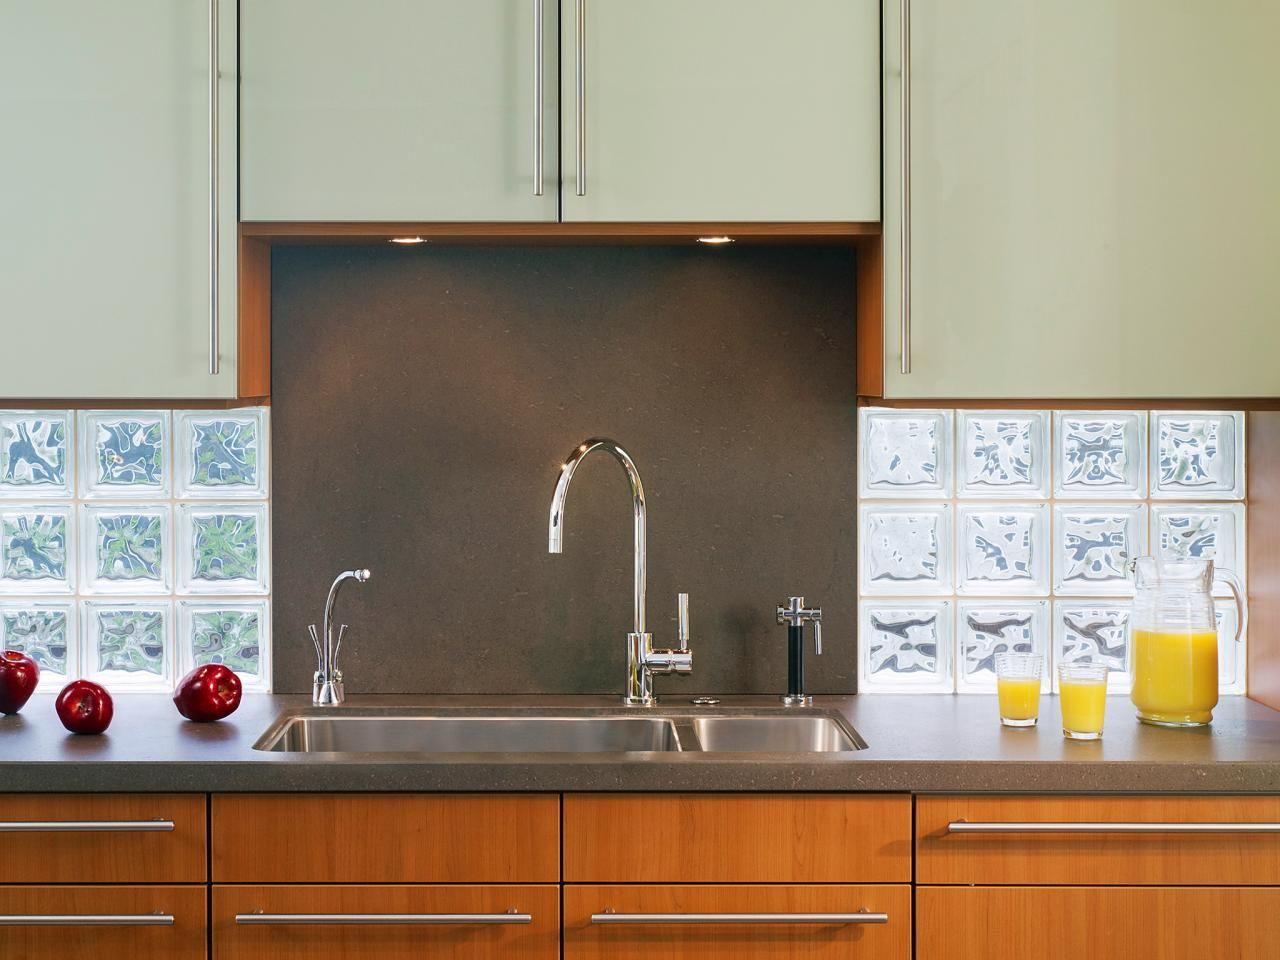 30 Trendiest Kitchen Backsplash Materials   Volcanic rock, Glass ...